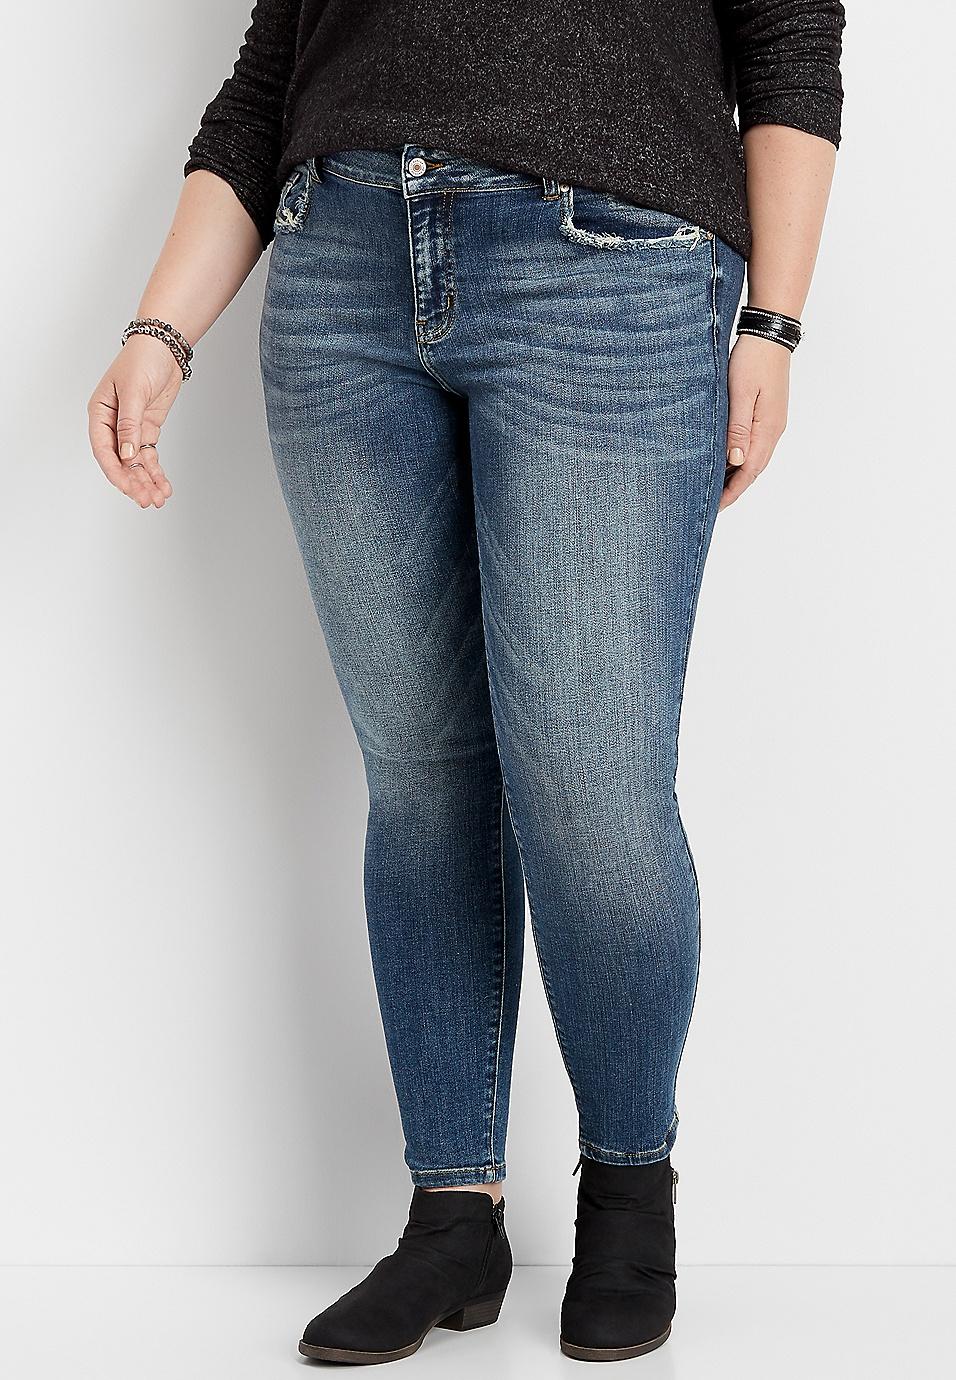 Plus Size Kancan Medium Tint Skinny Jean Maurices